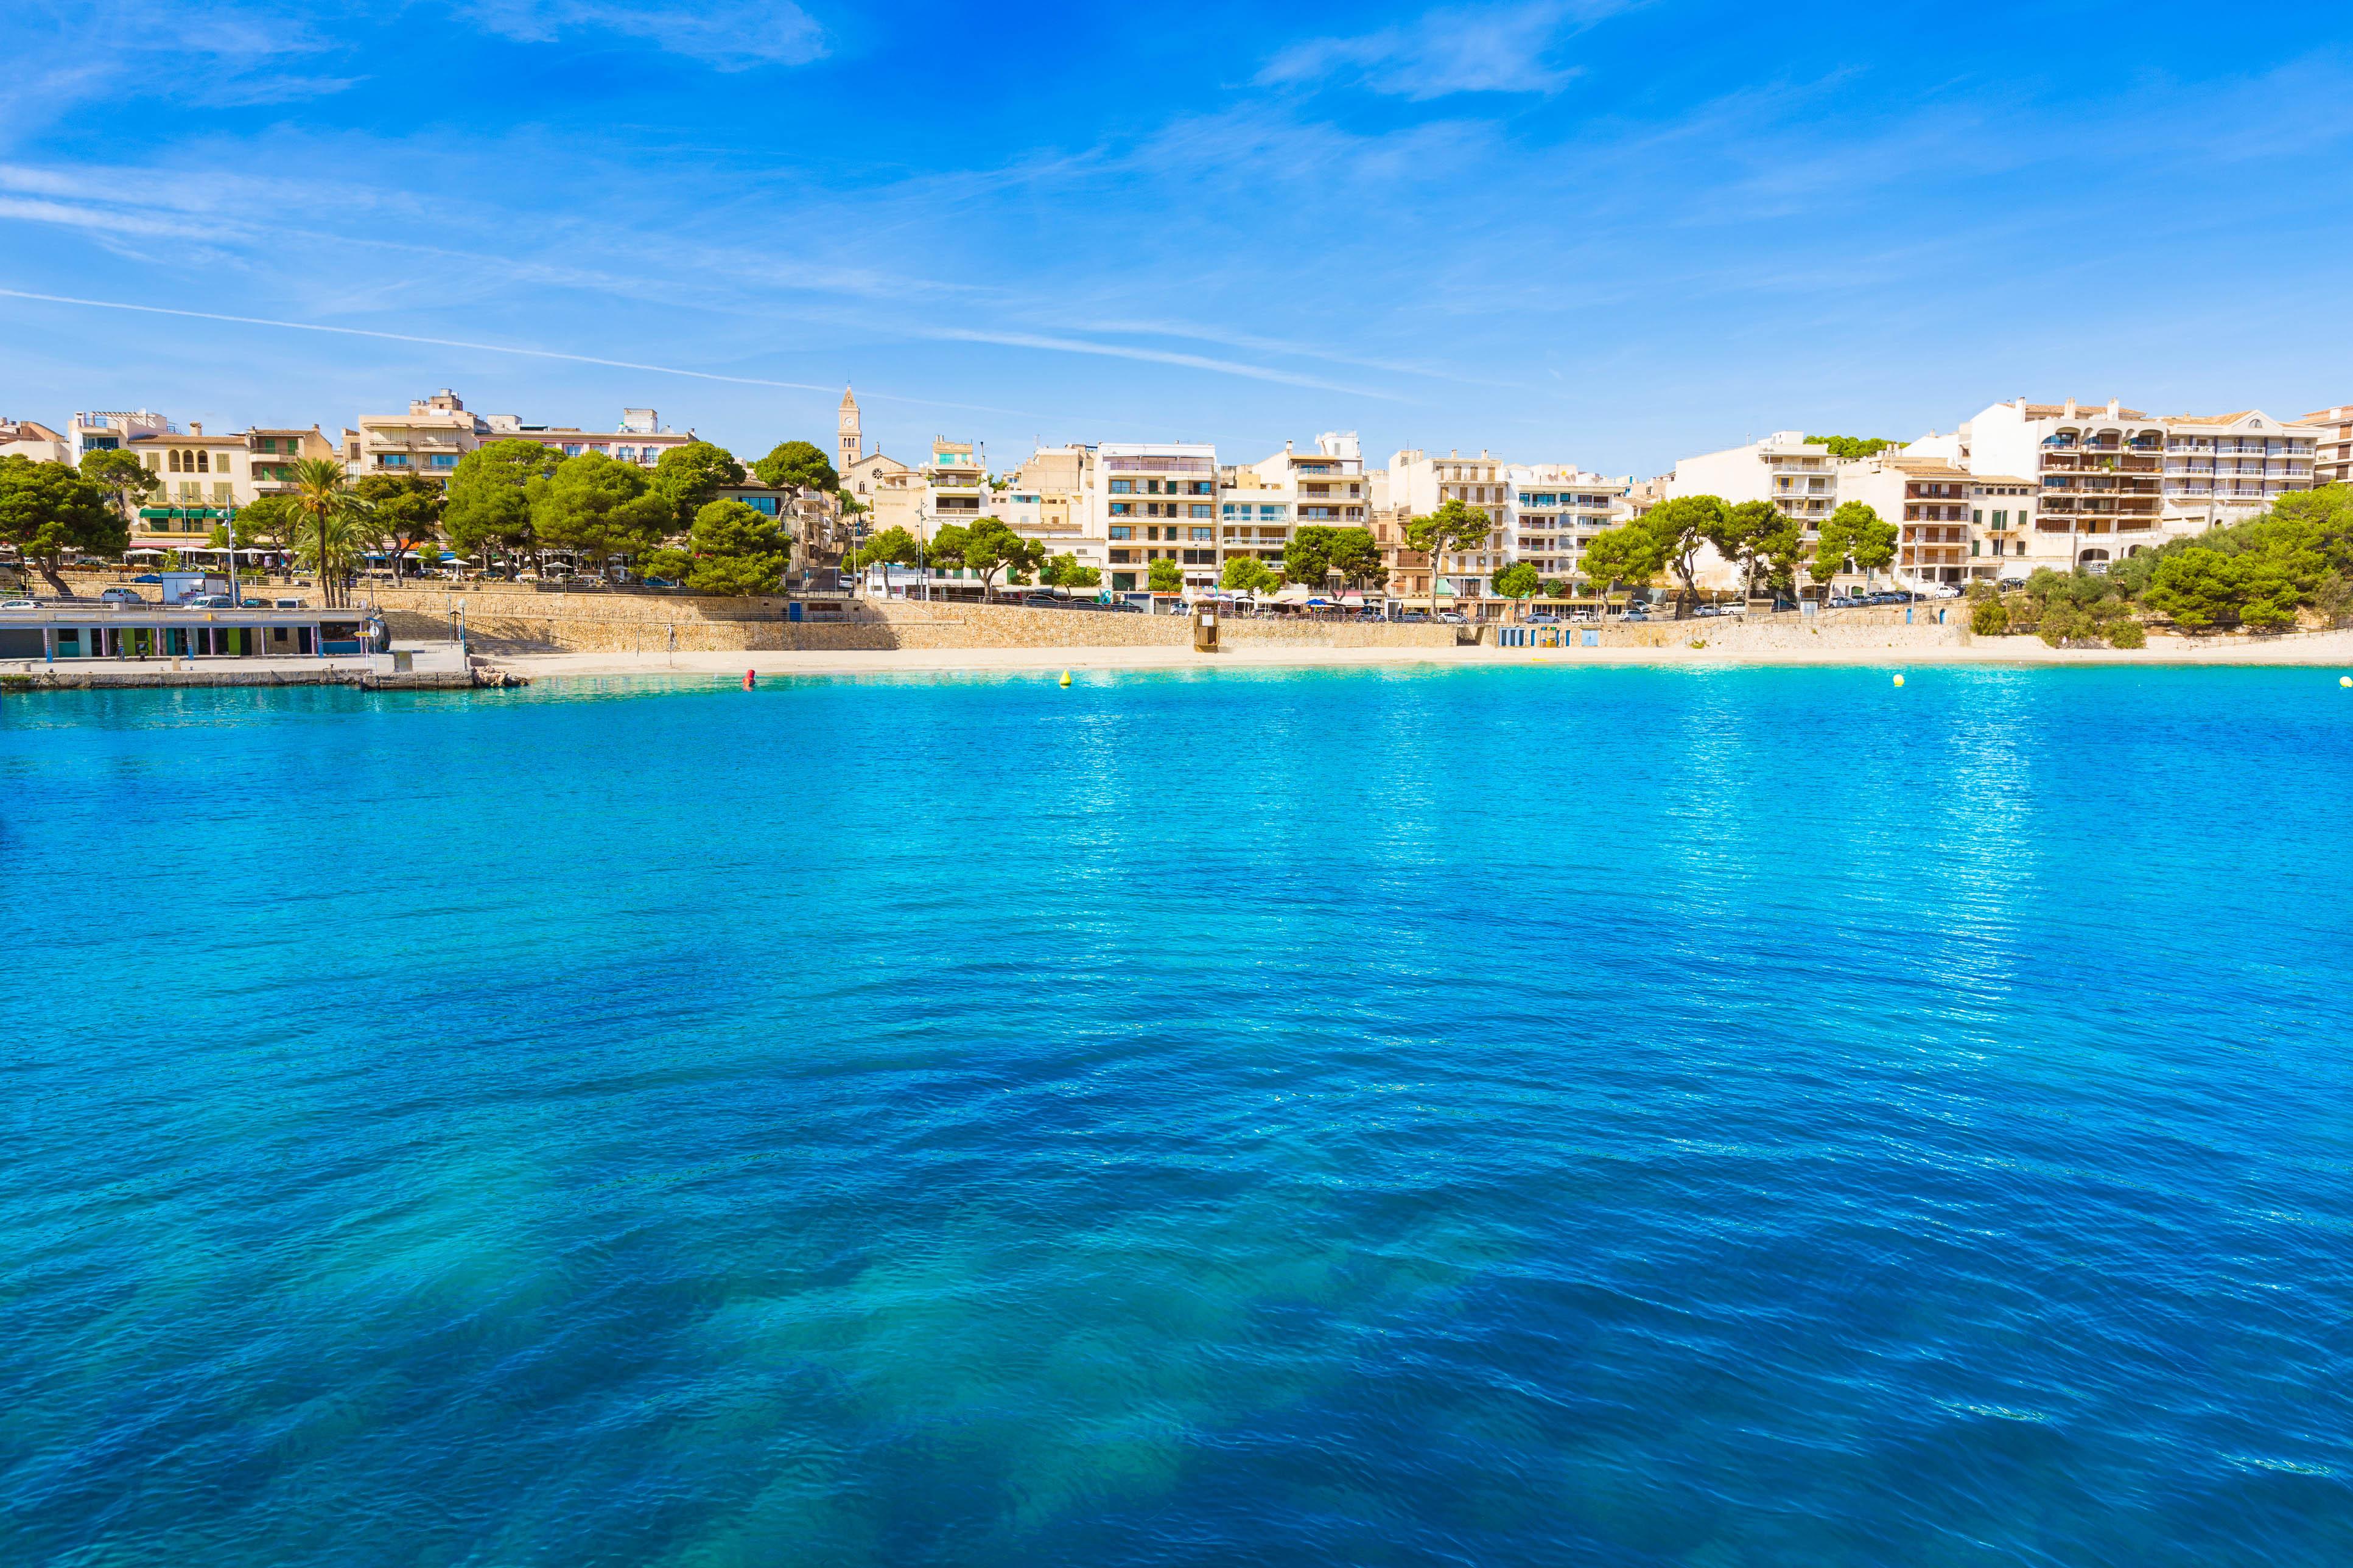 Hotel Don Pepe Mallorca